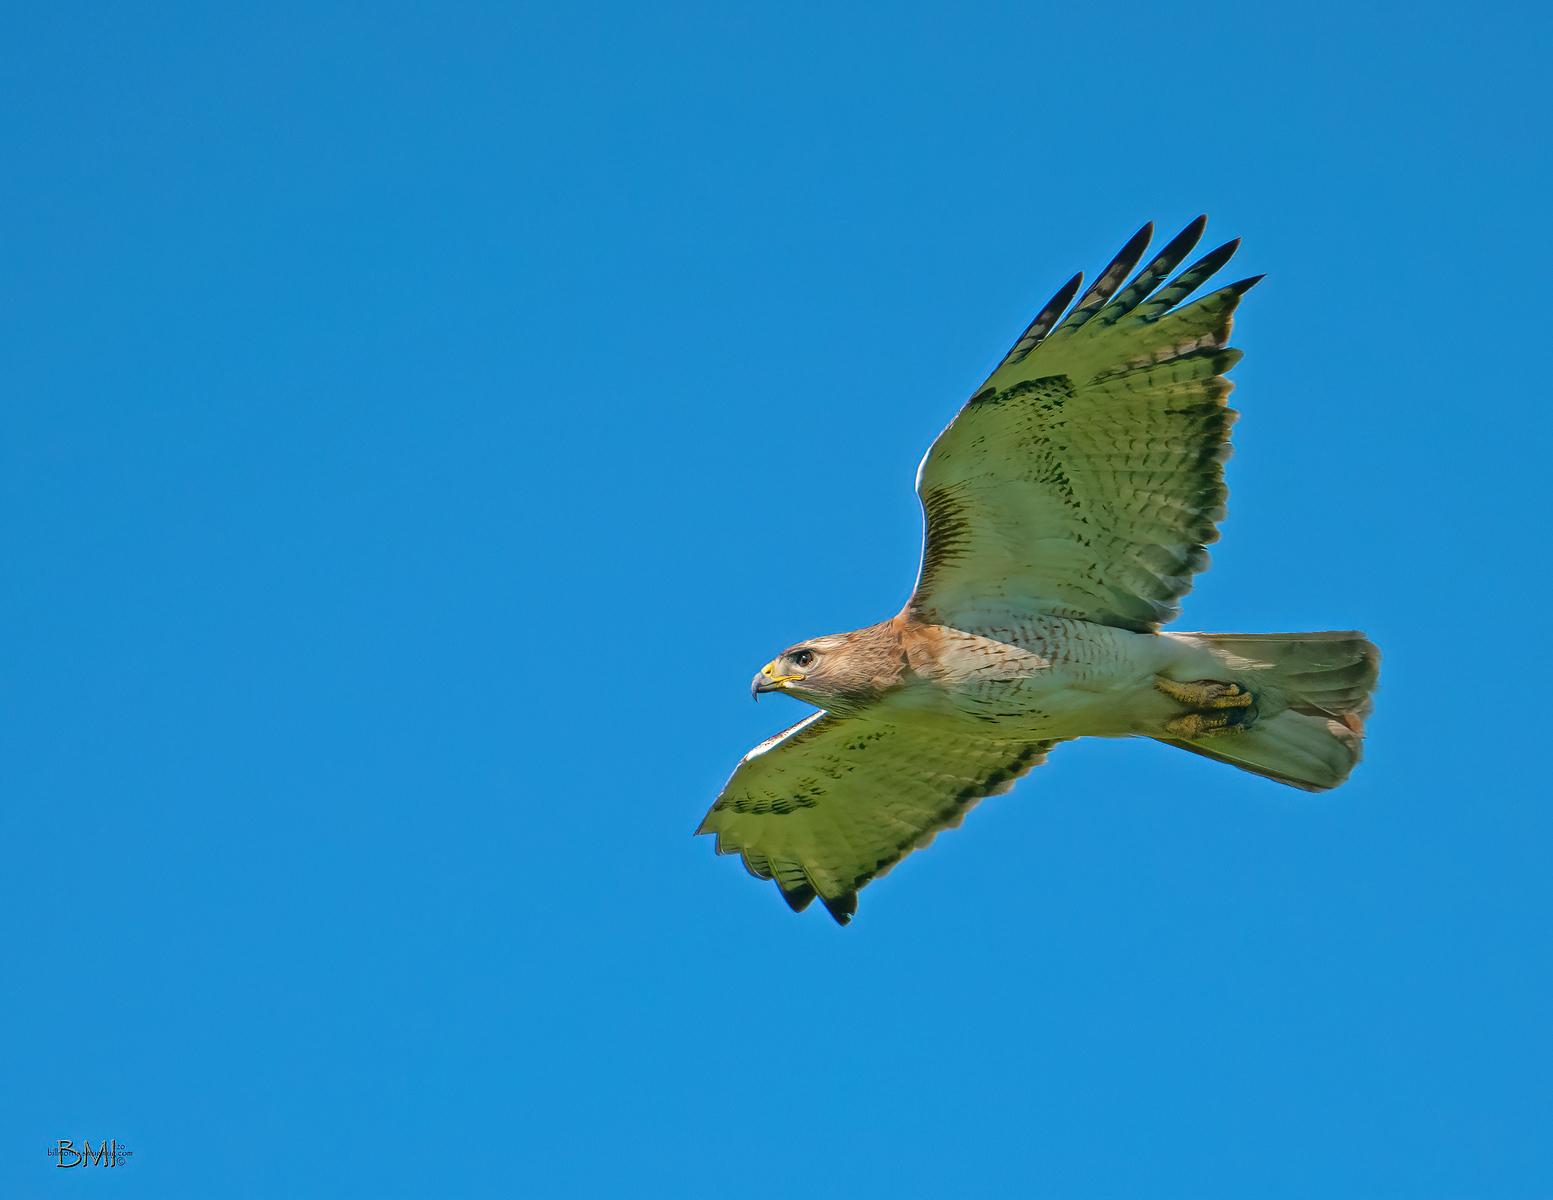 IMAGE: https://photos.smugmug.com/Beautyinthetreesandintheair/Raptors/i-DNhJPSH/0/07f39bc6/X3/Red-tailed%20hawk_9_4-12-2020-230-X3.jpg